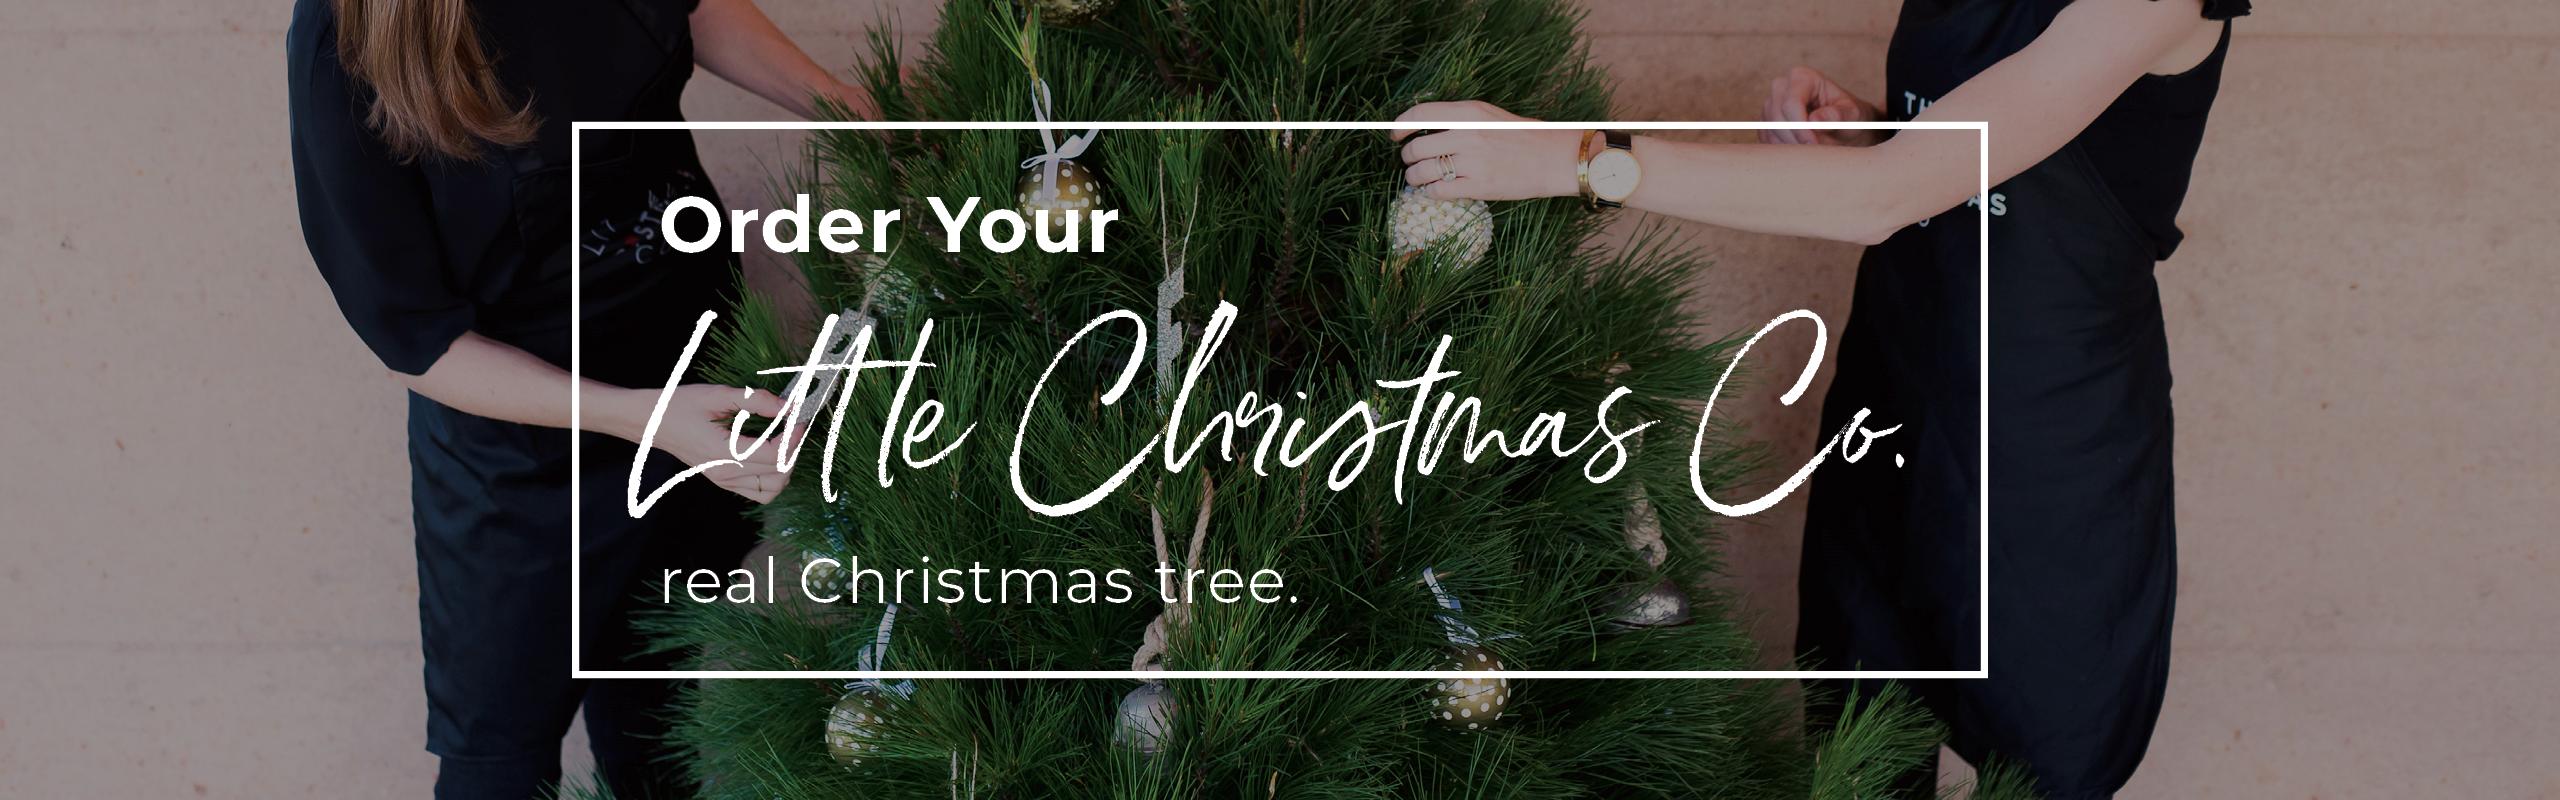 Christmas Trees01